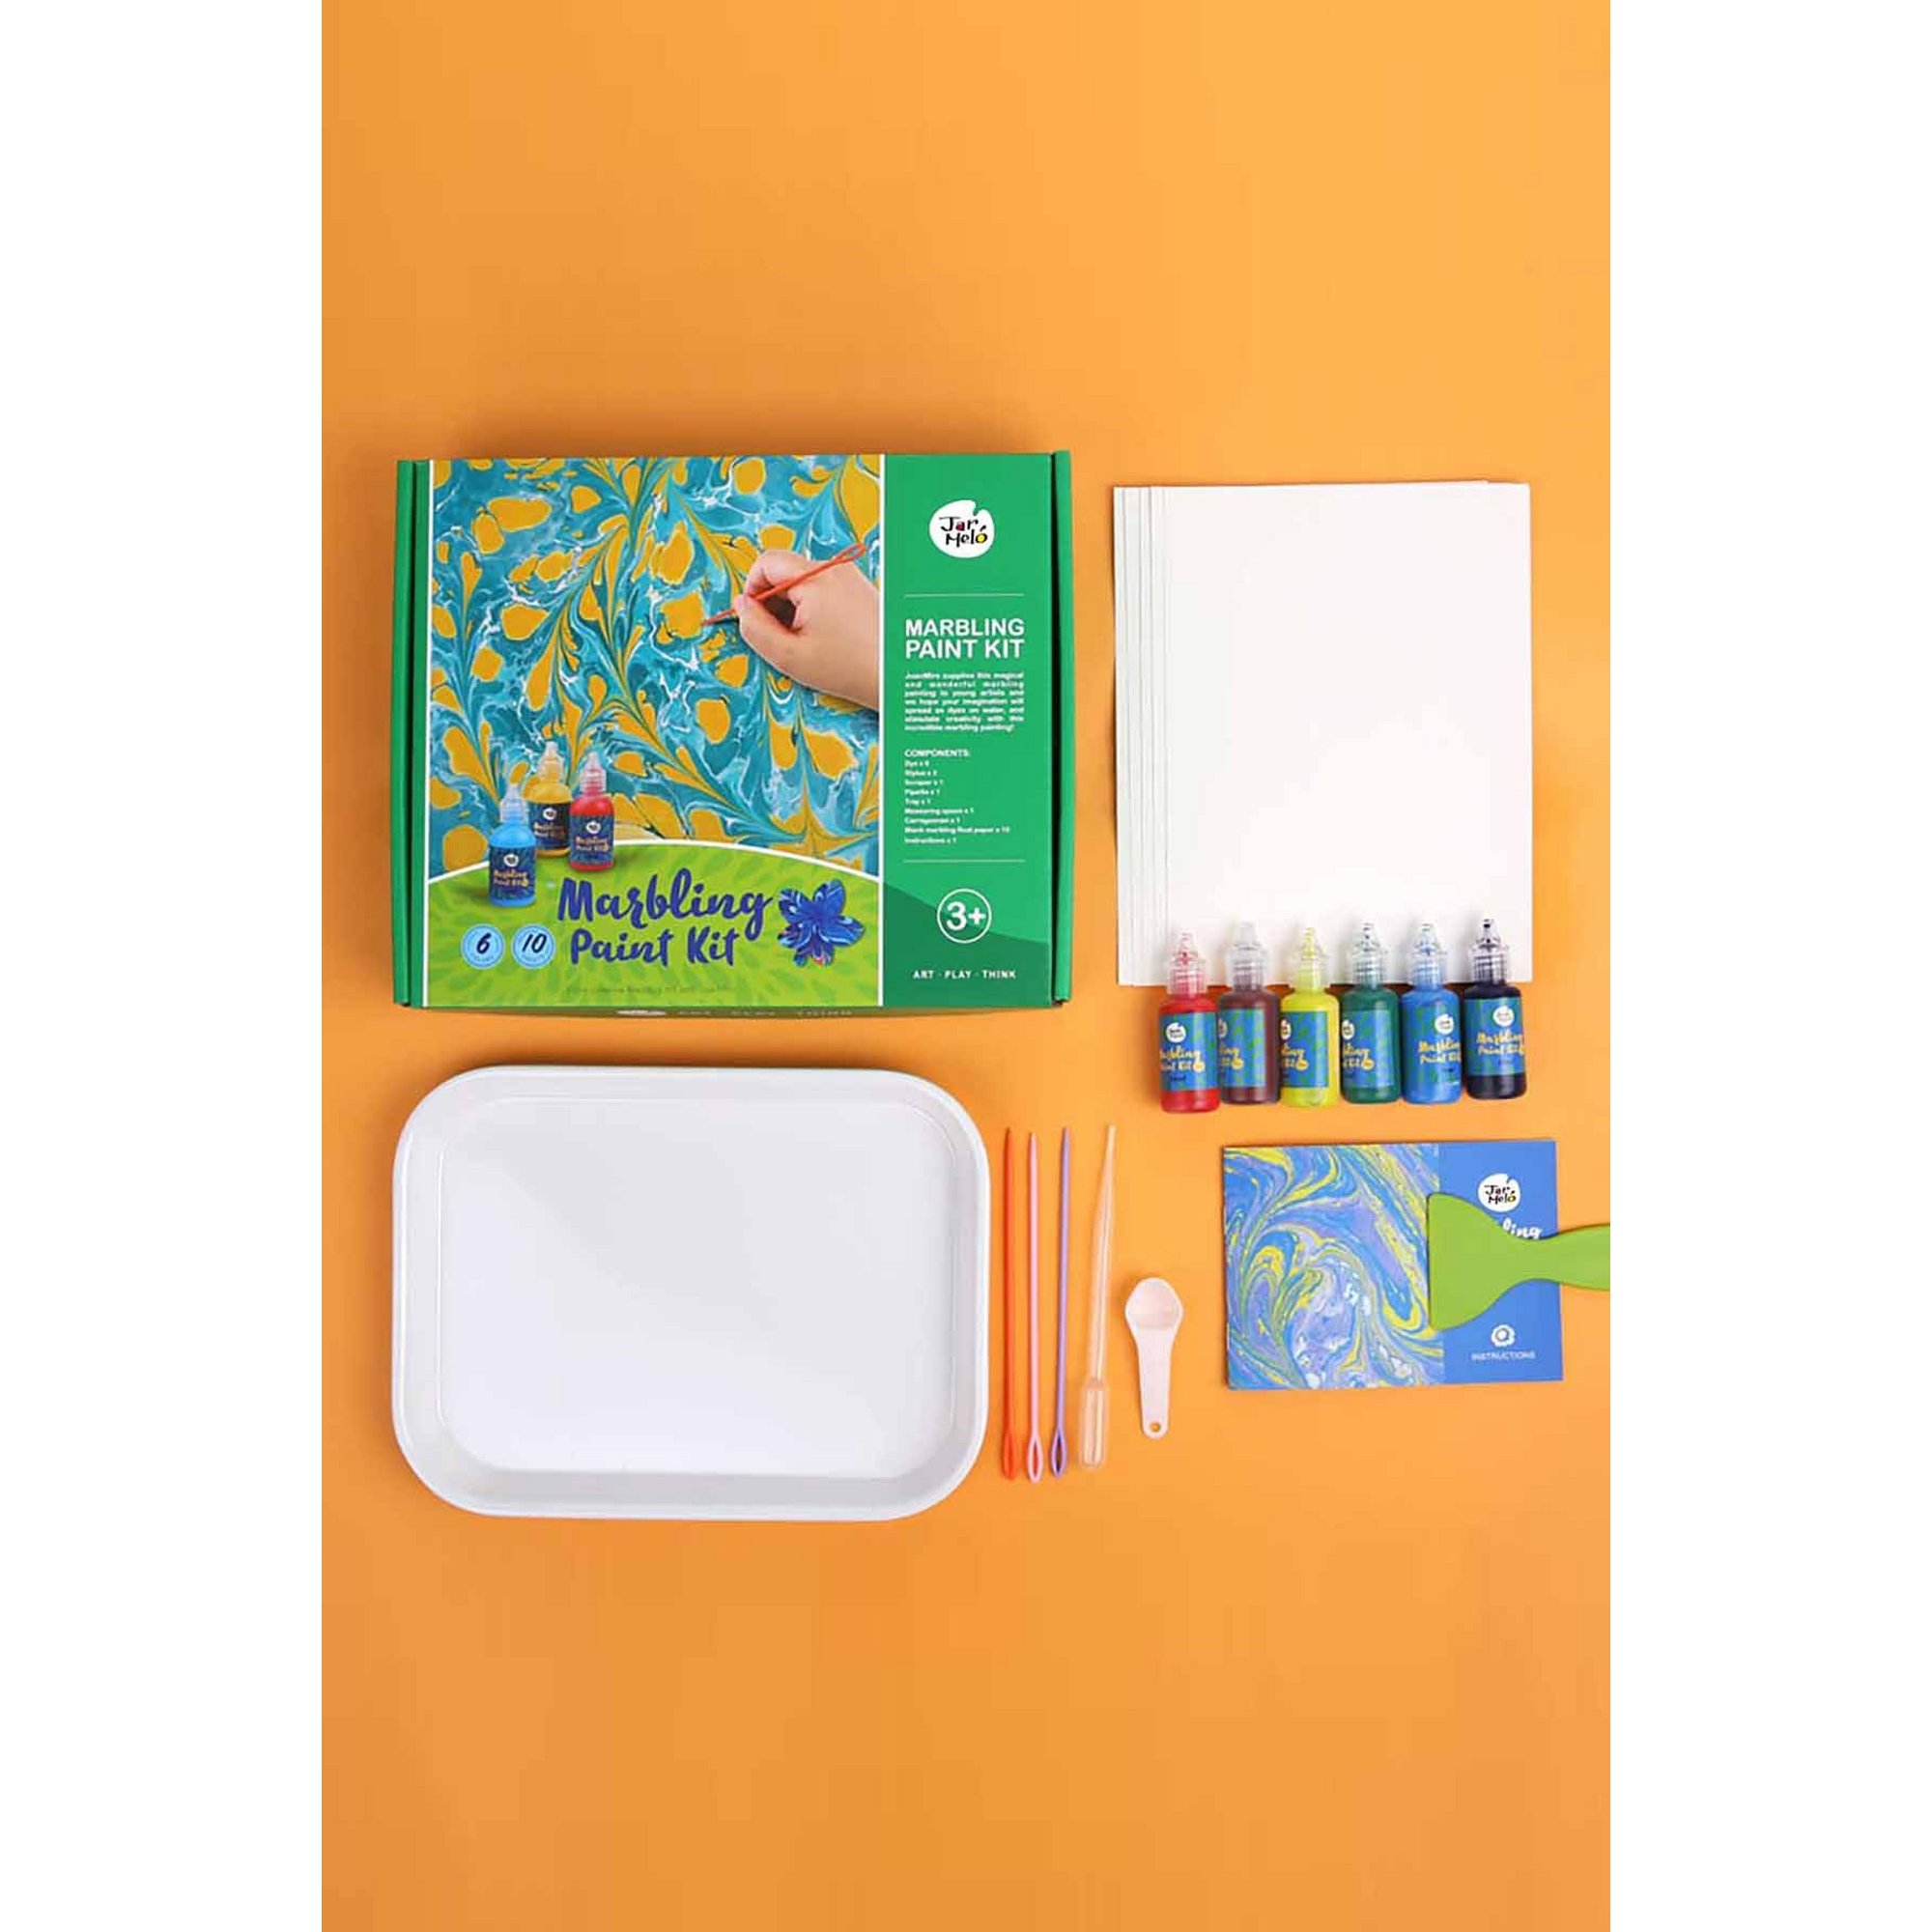 Image of Marbling Paint Kit